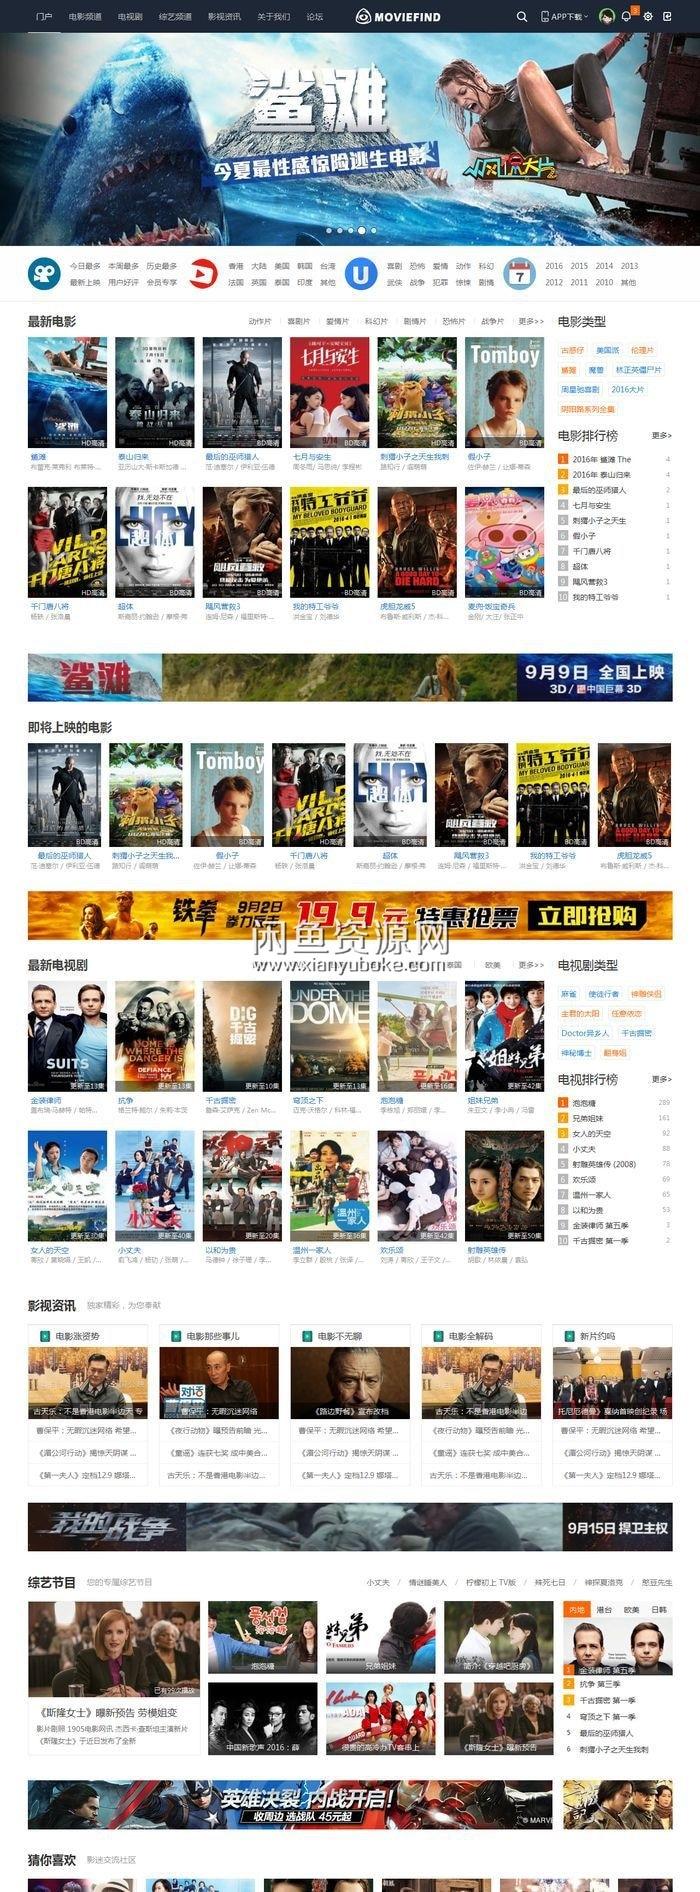 Discuz x3.4模板 迪恩 电影电视剧视频 商业版 GBK DZ影视网站模板